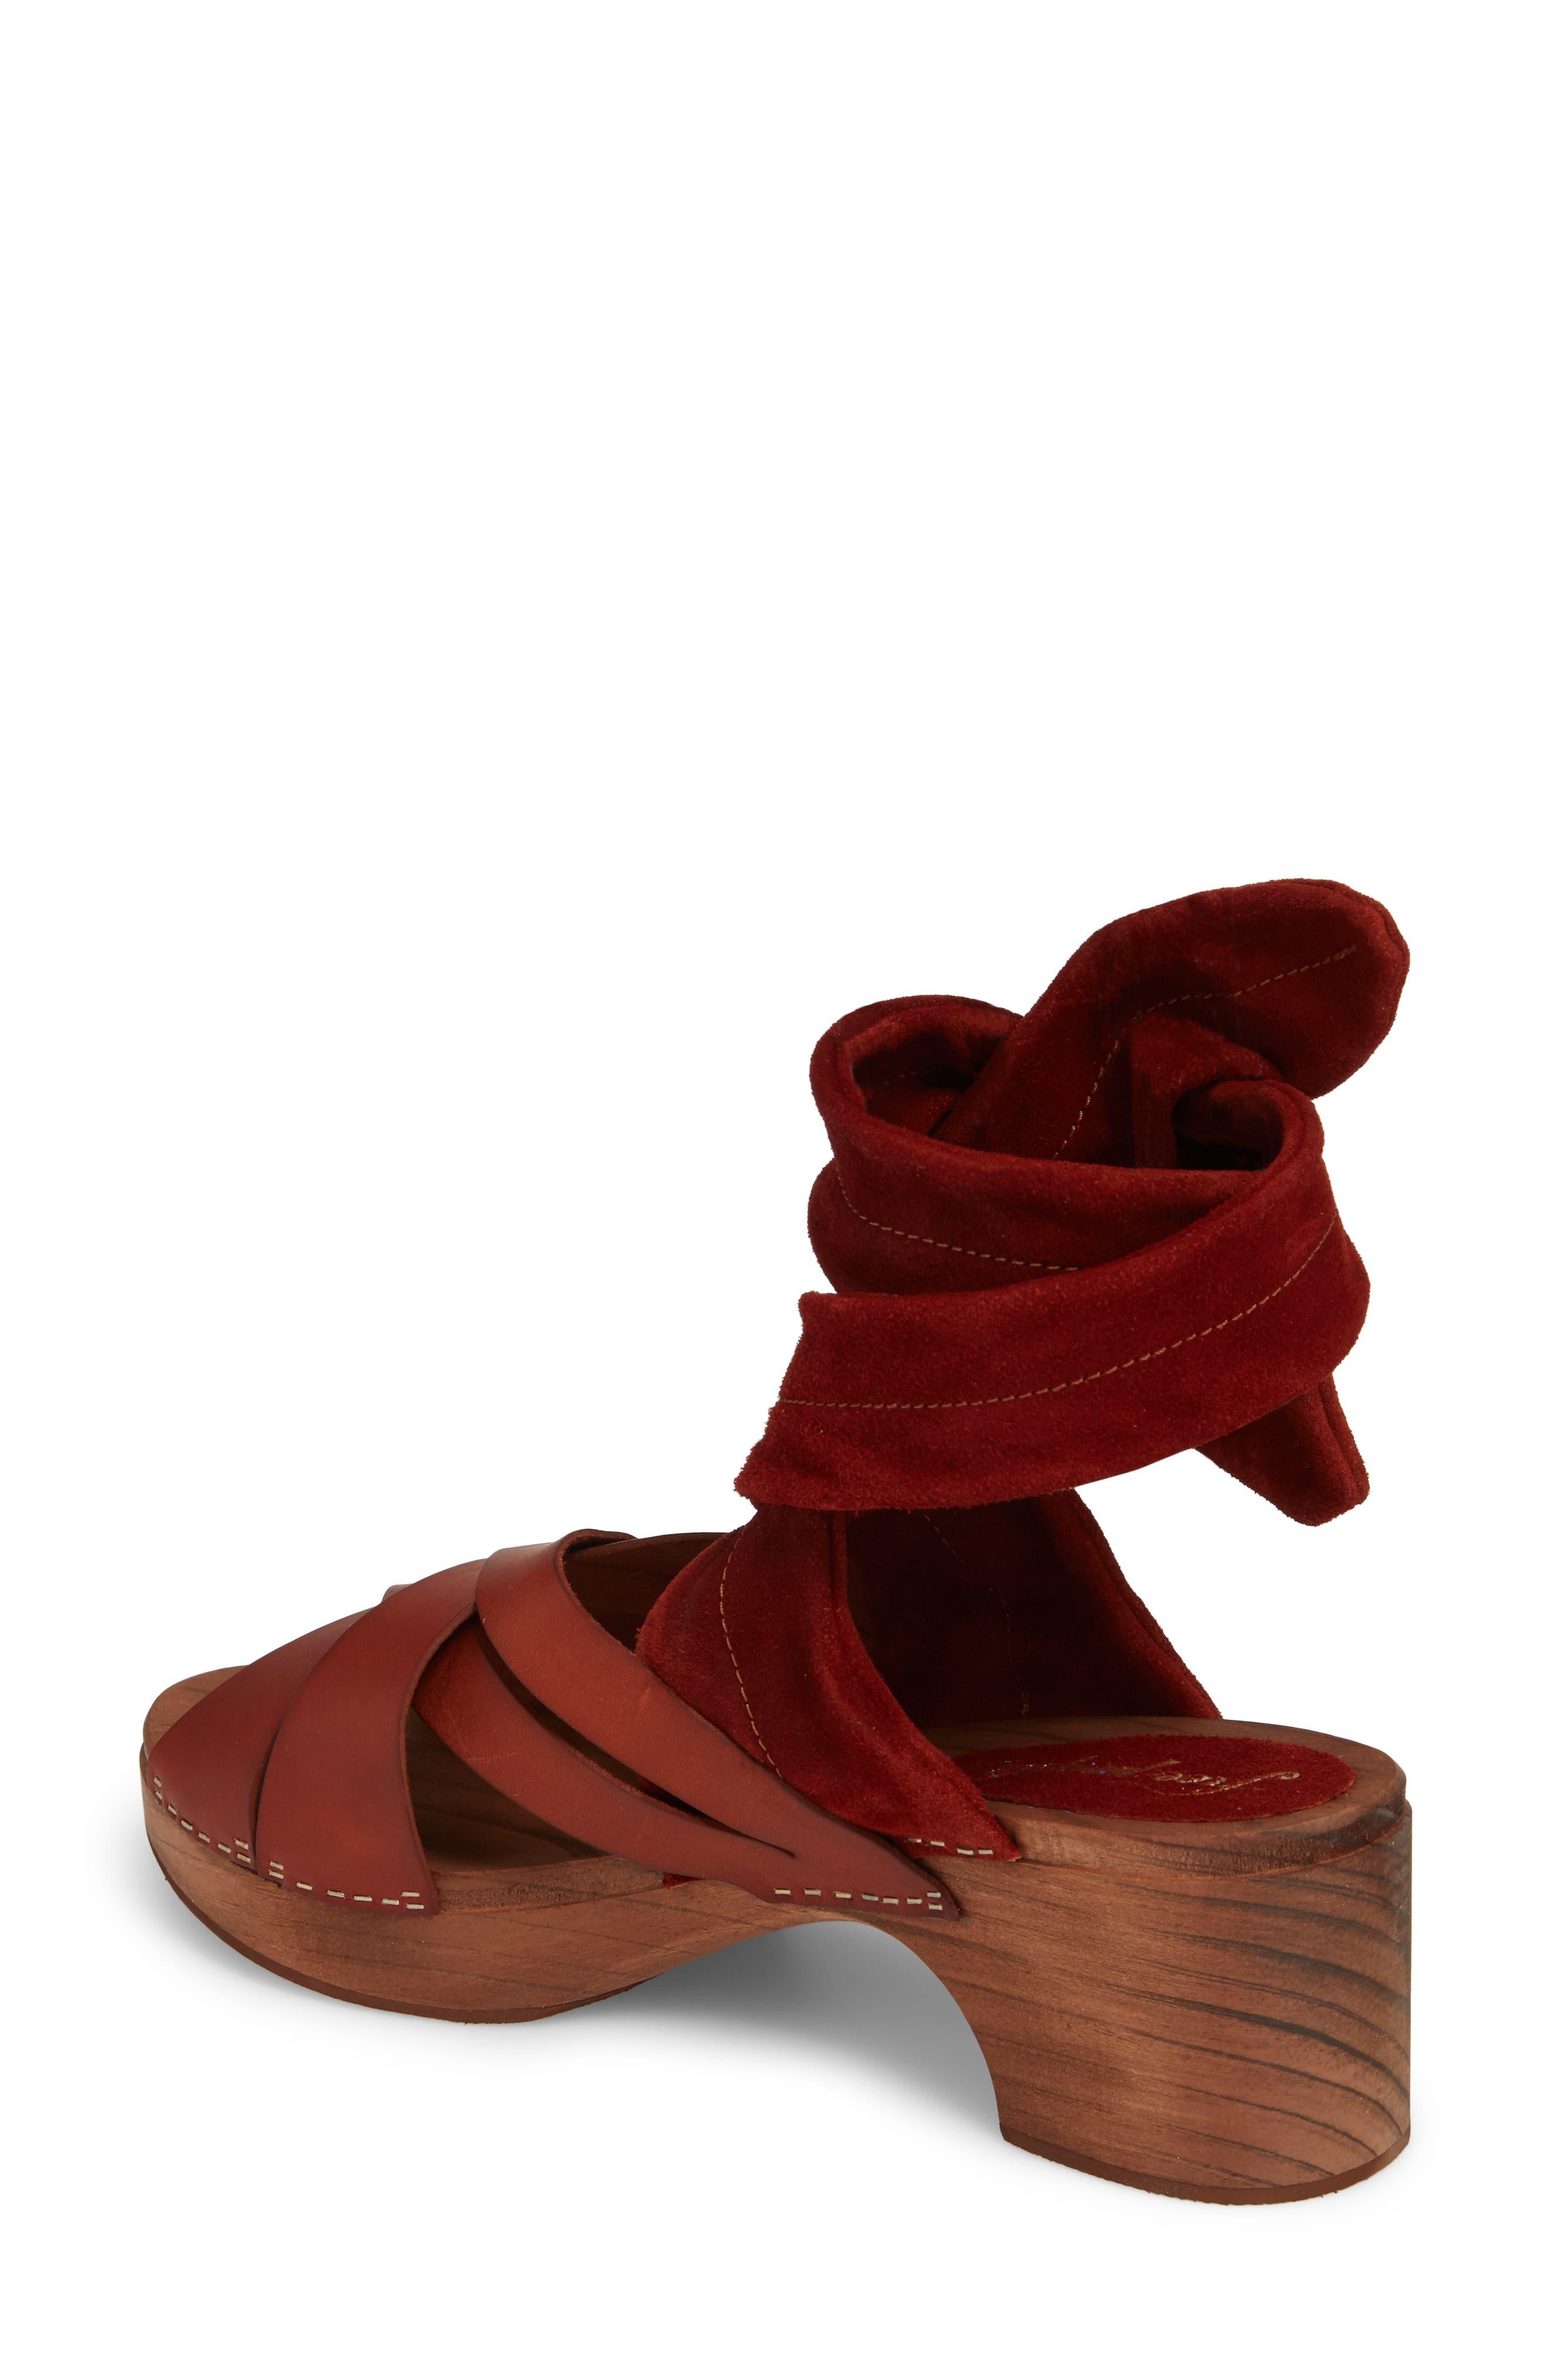 Emmy Ankle Wrap Sandal,                             Alternate thumbnail 2, color,